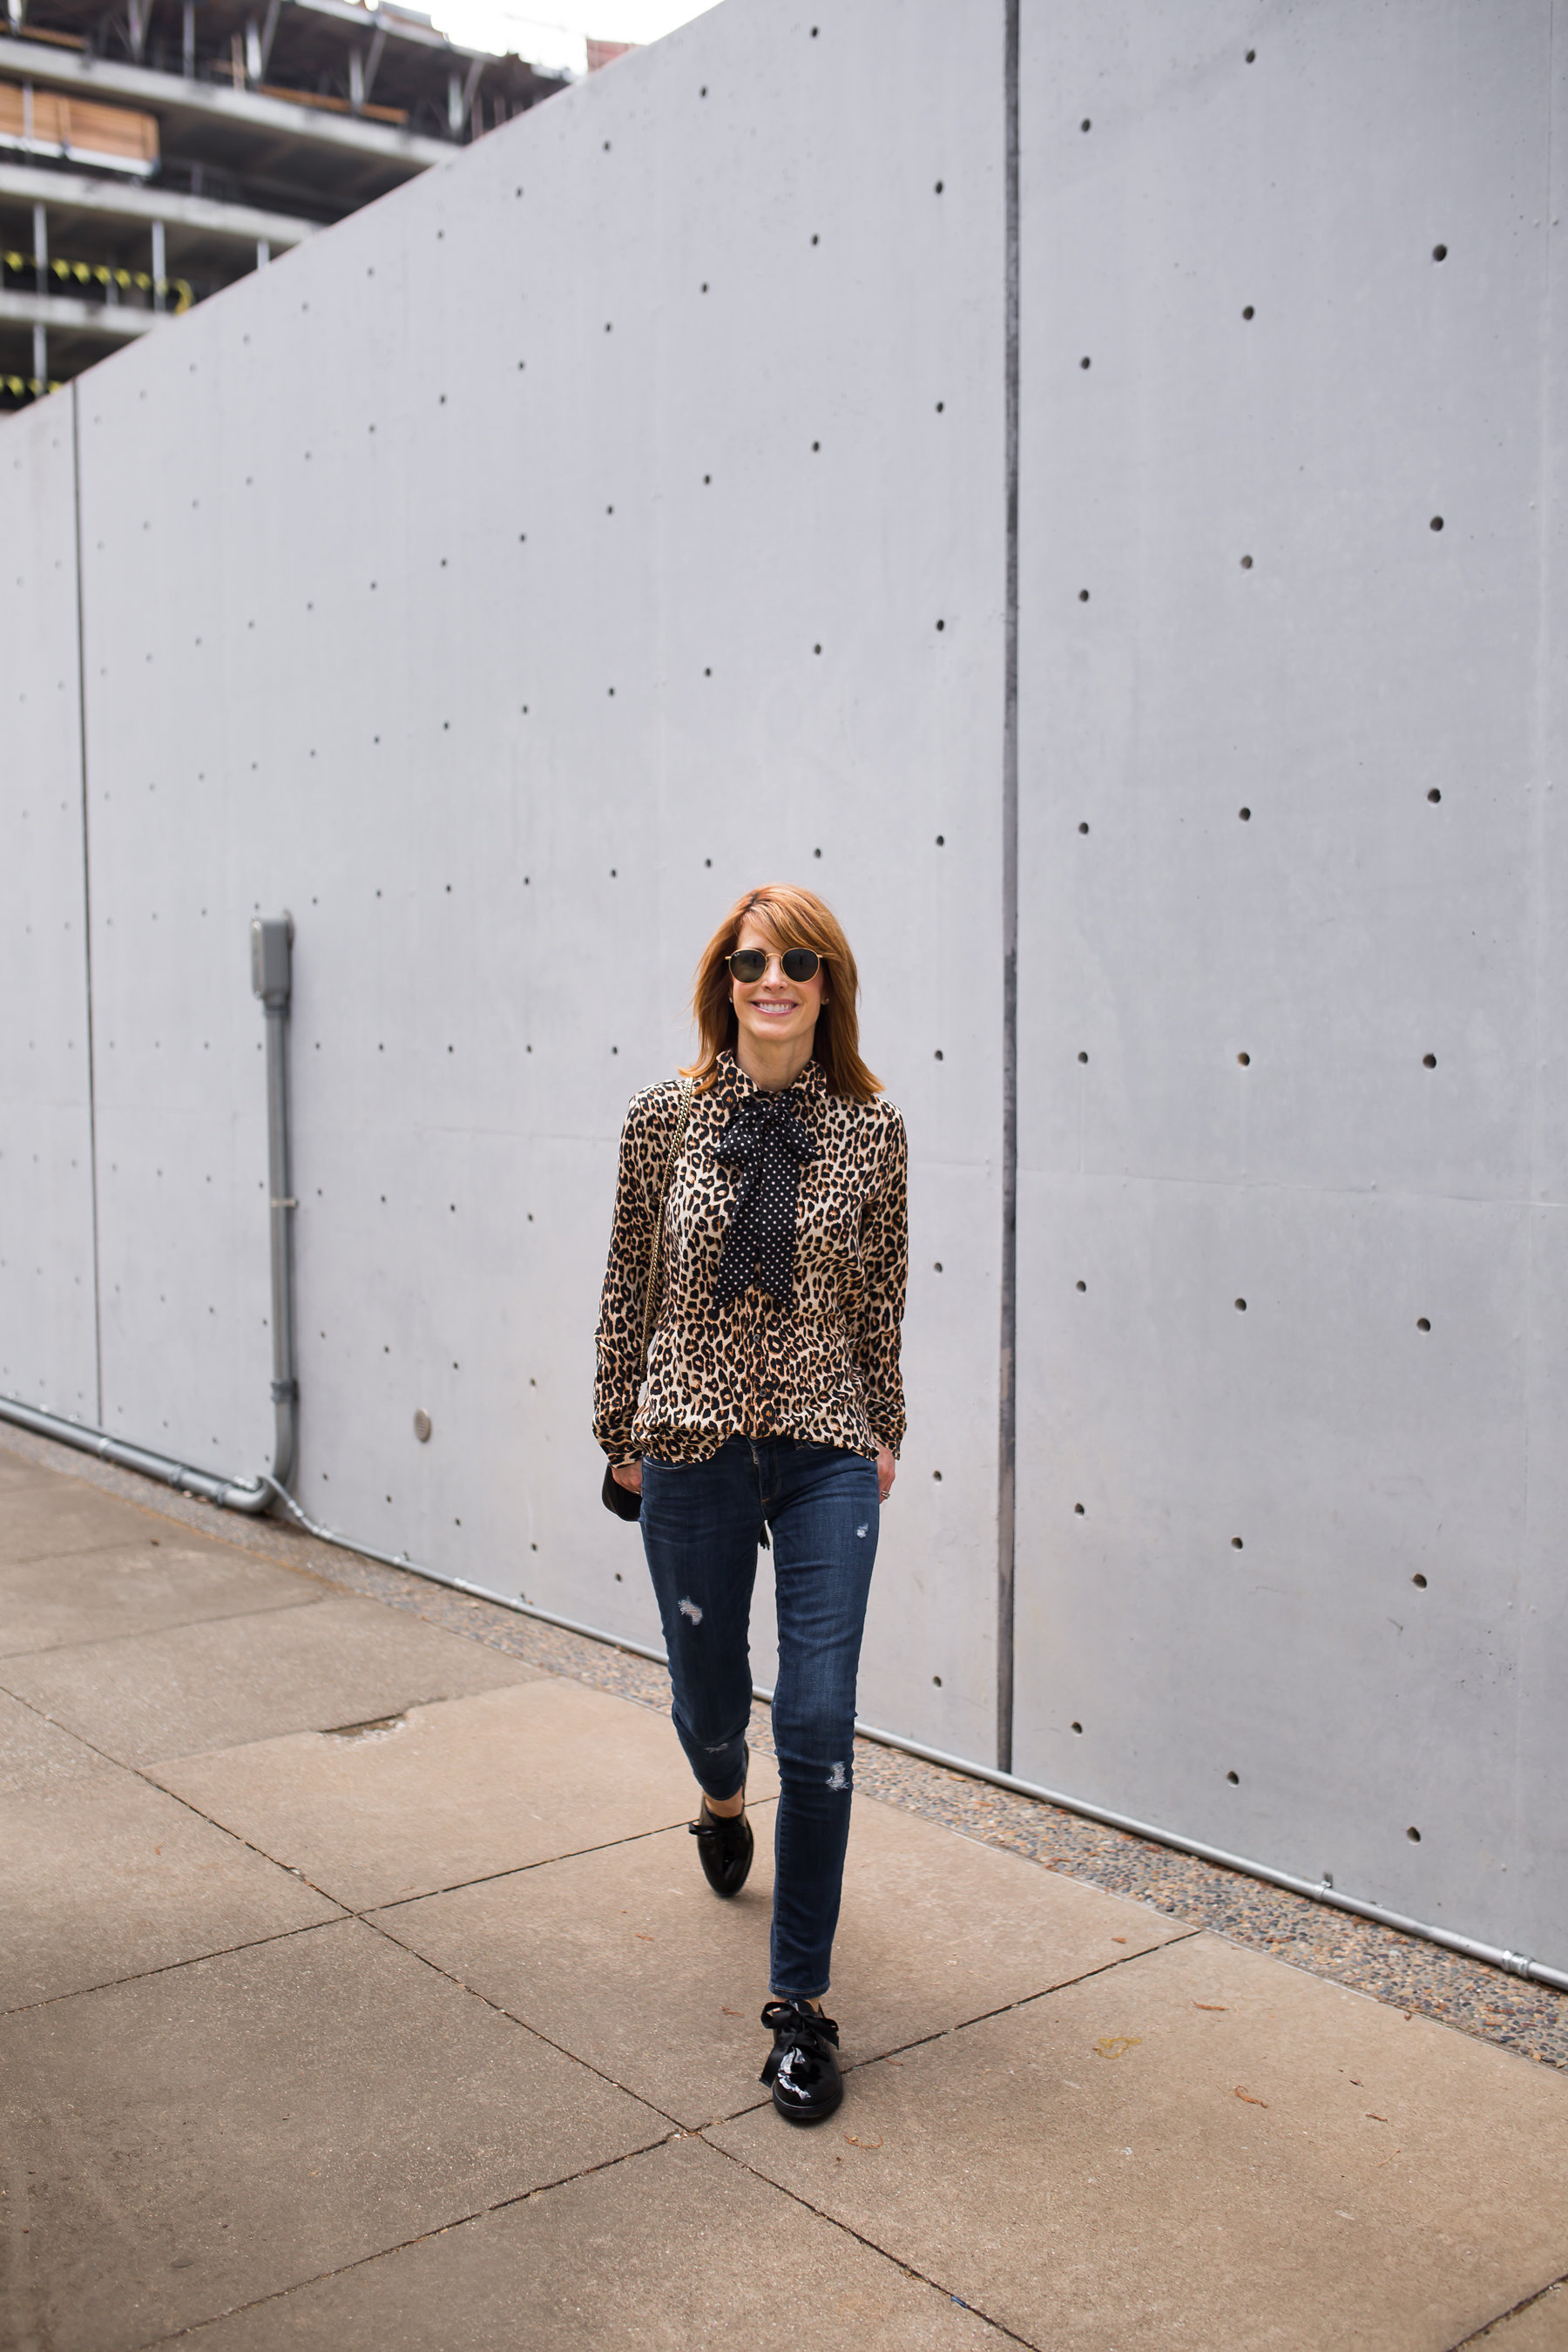 dallas blogger, fashion blogger, fashion blogger over 50